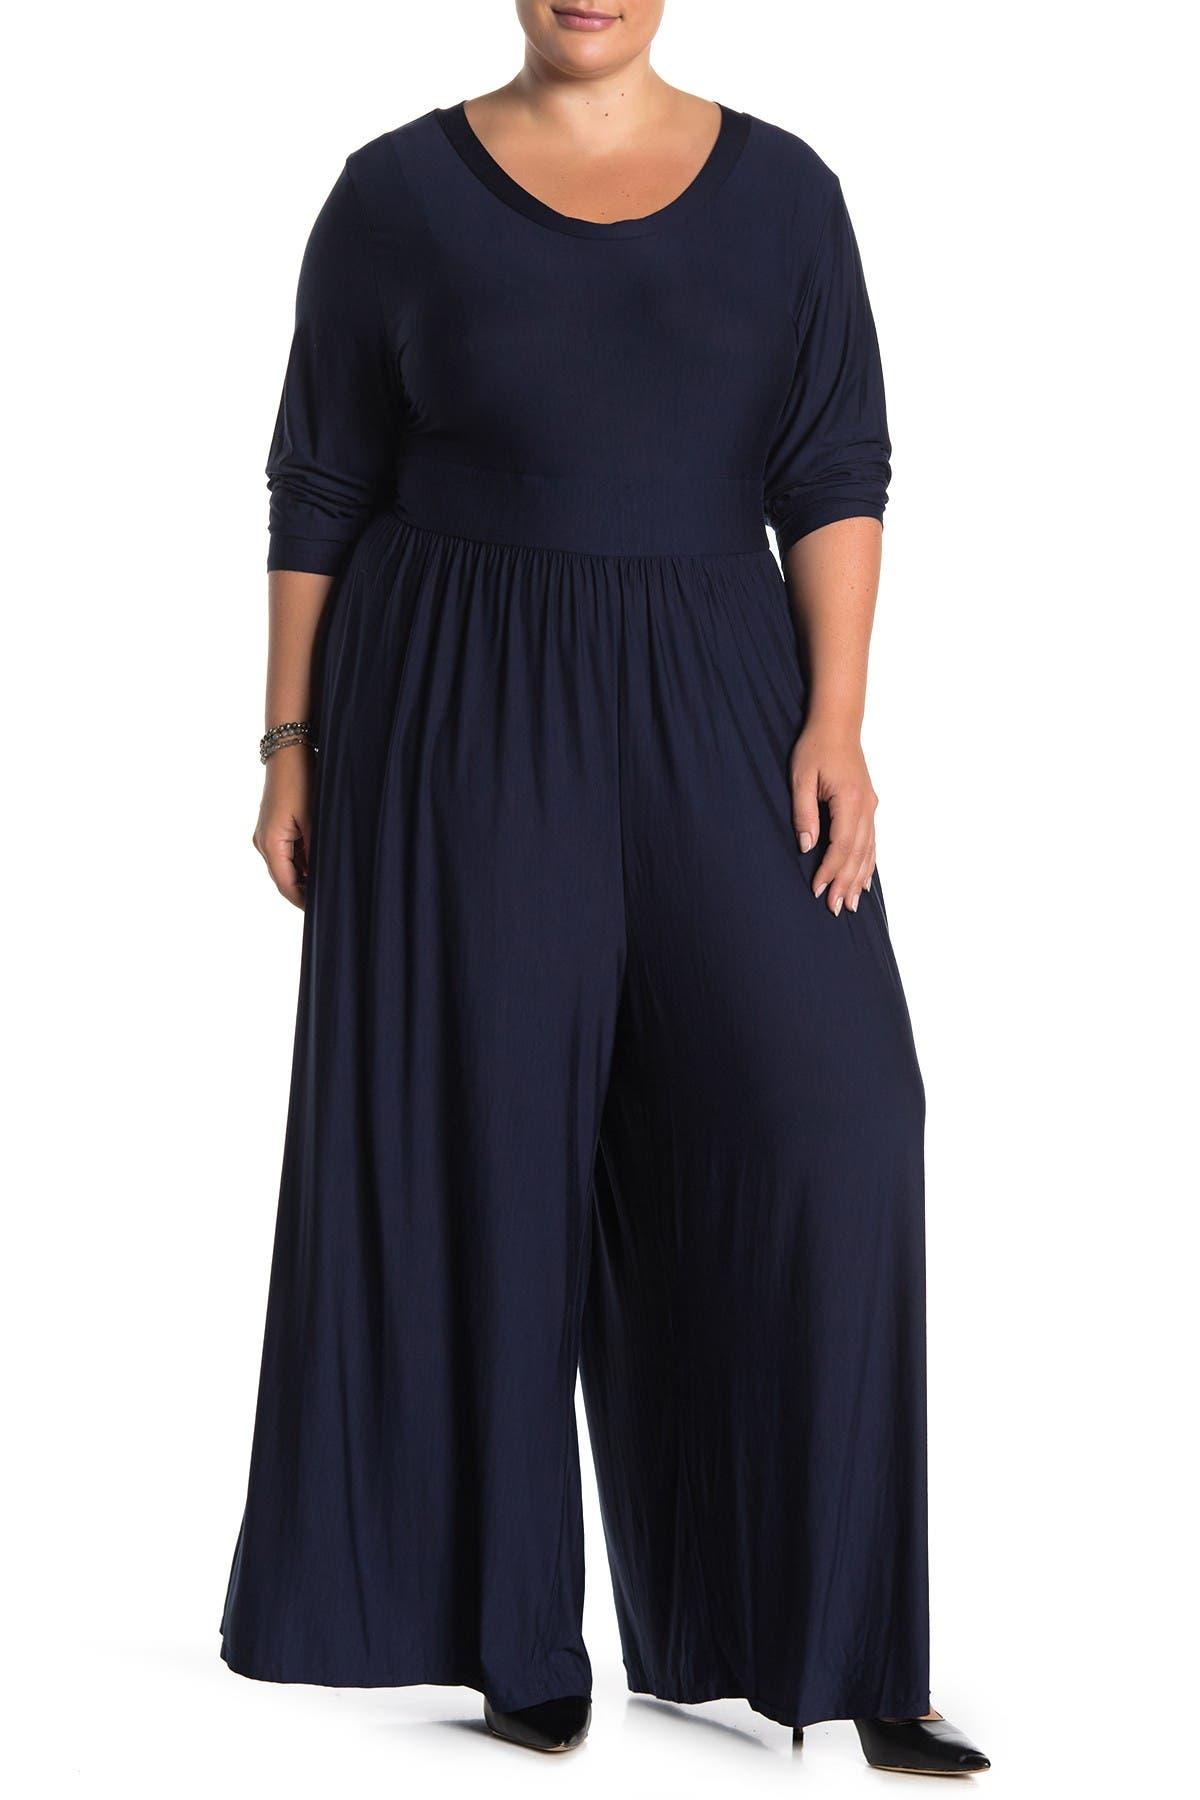 Image of WEST KEI Long Sleeve Knit Jumpsuit